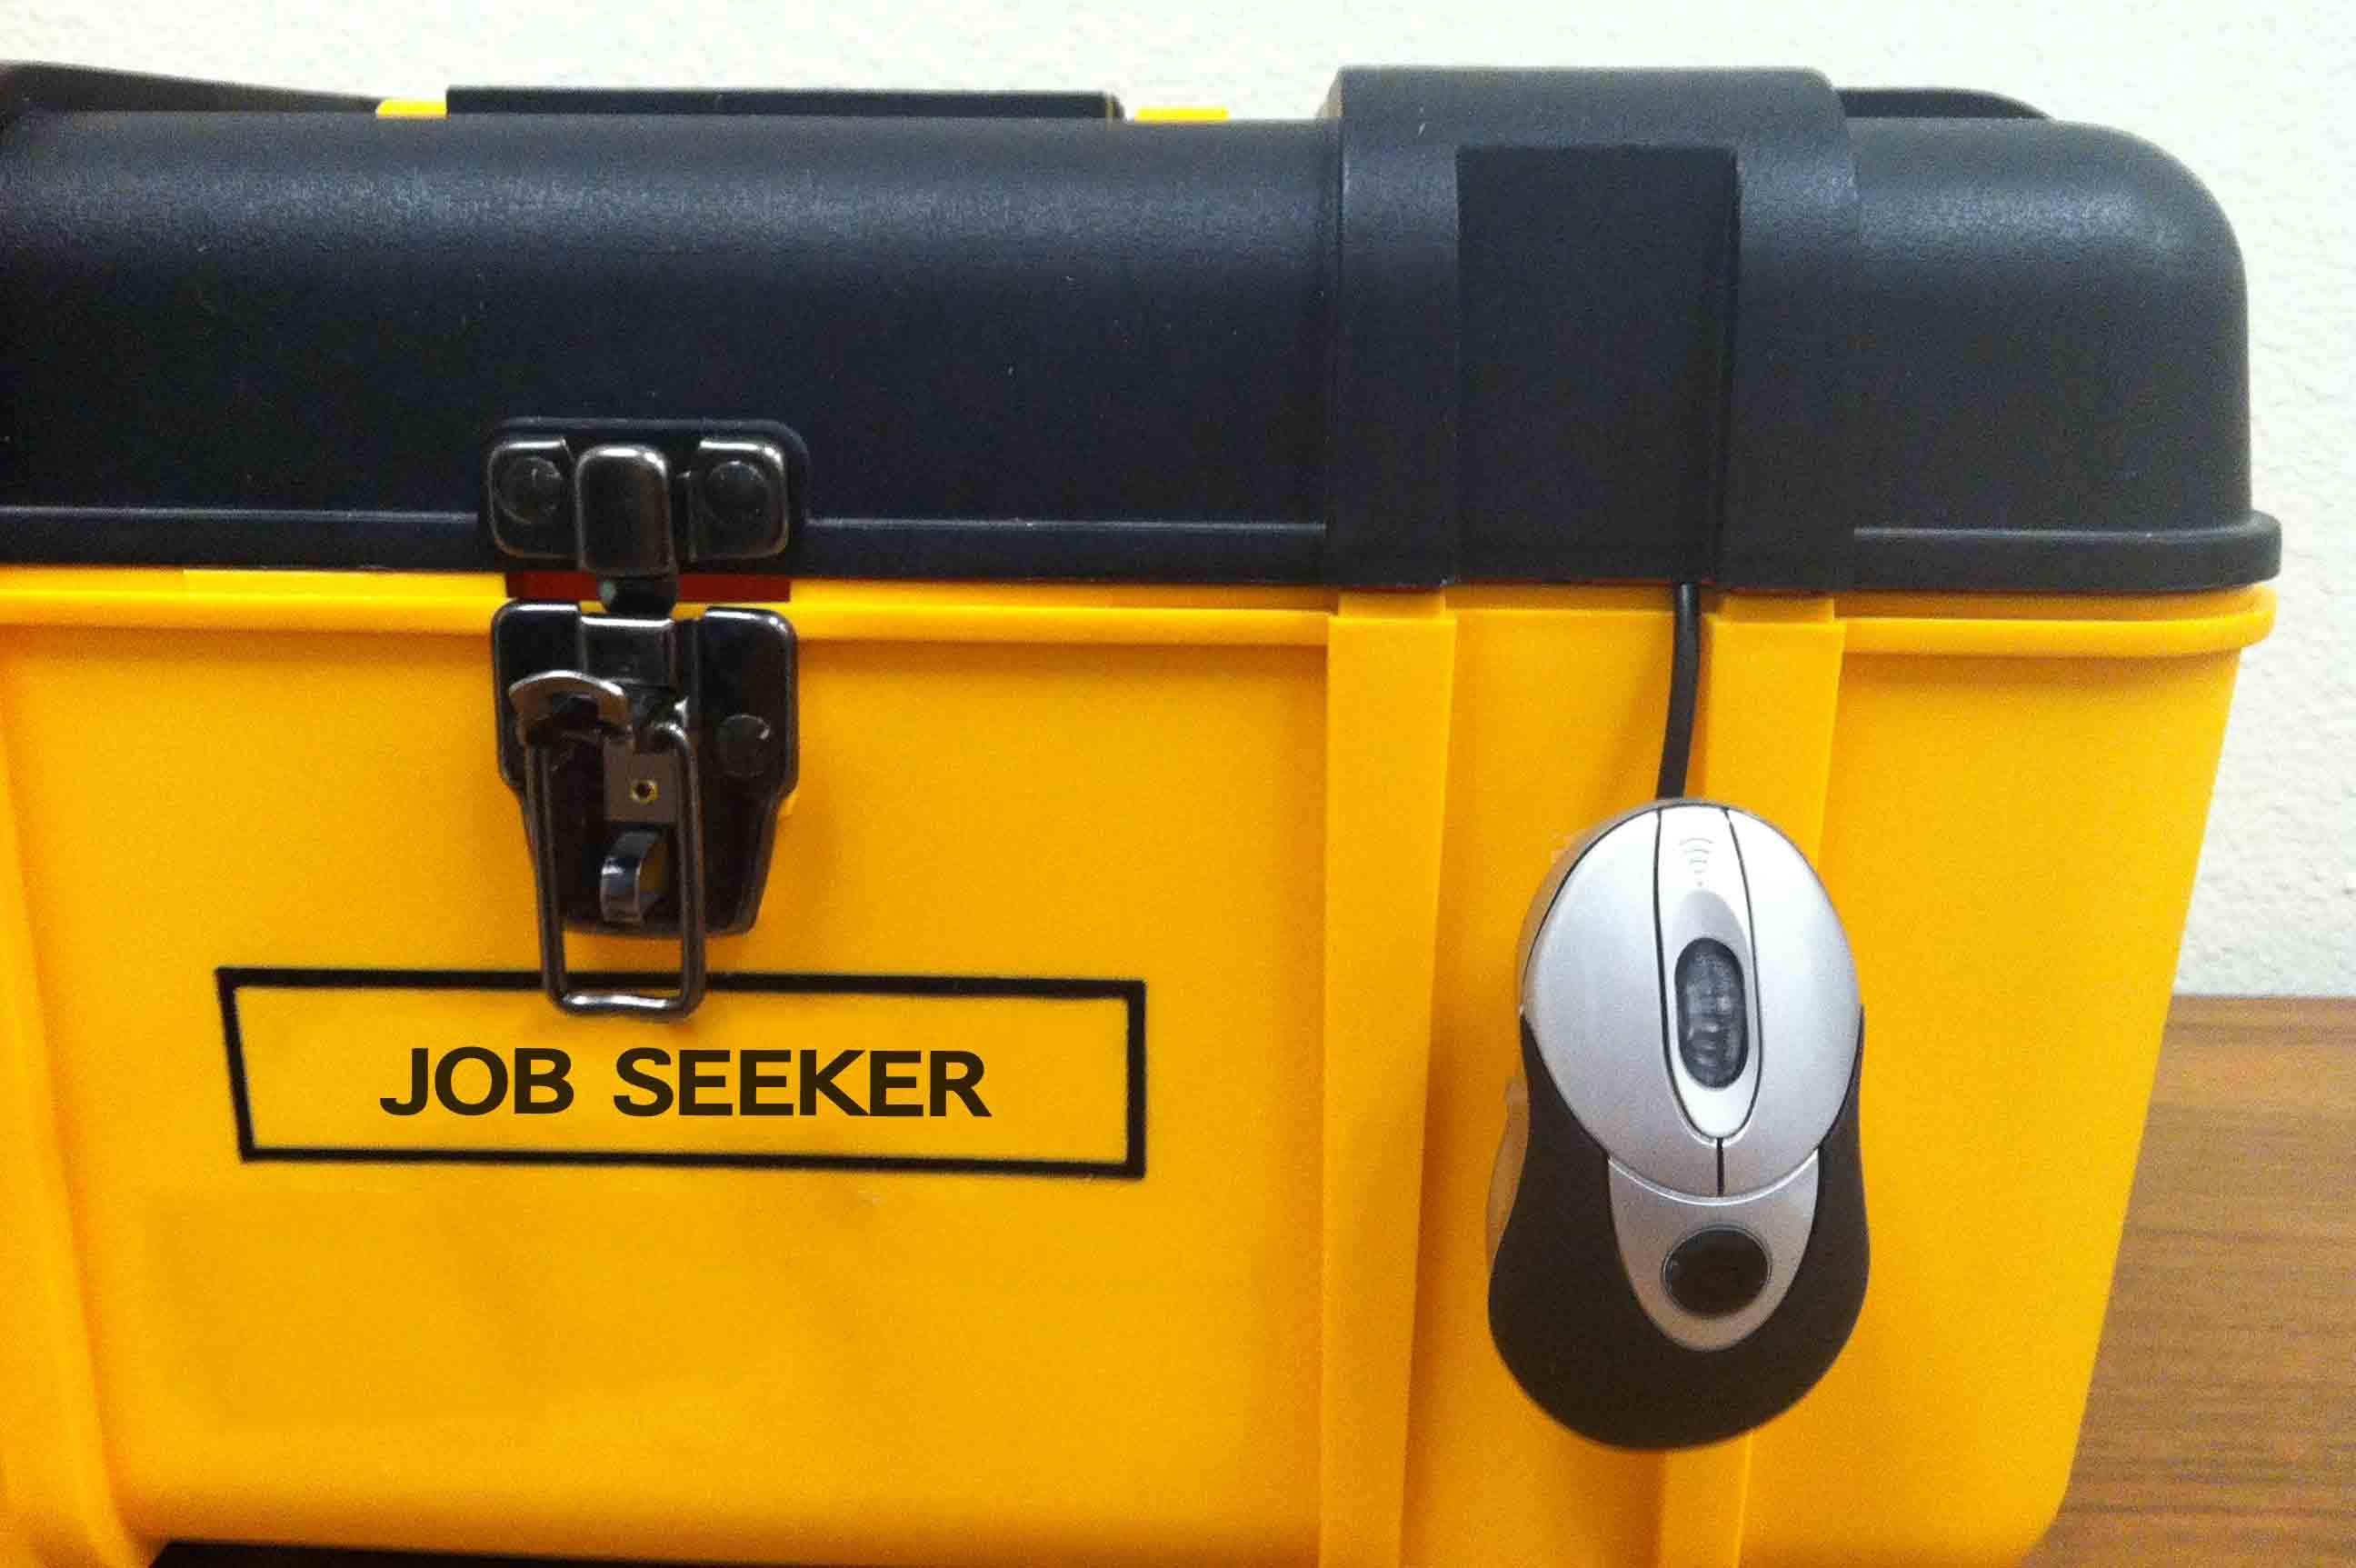 job seeker toolkit a world of opportunities toolbox